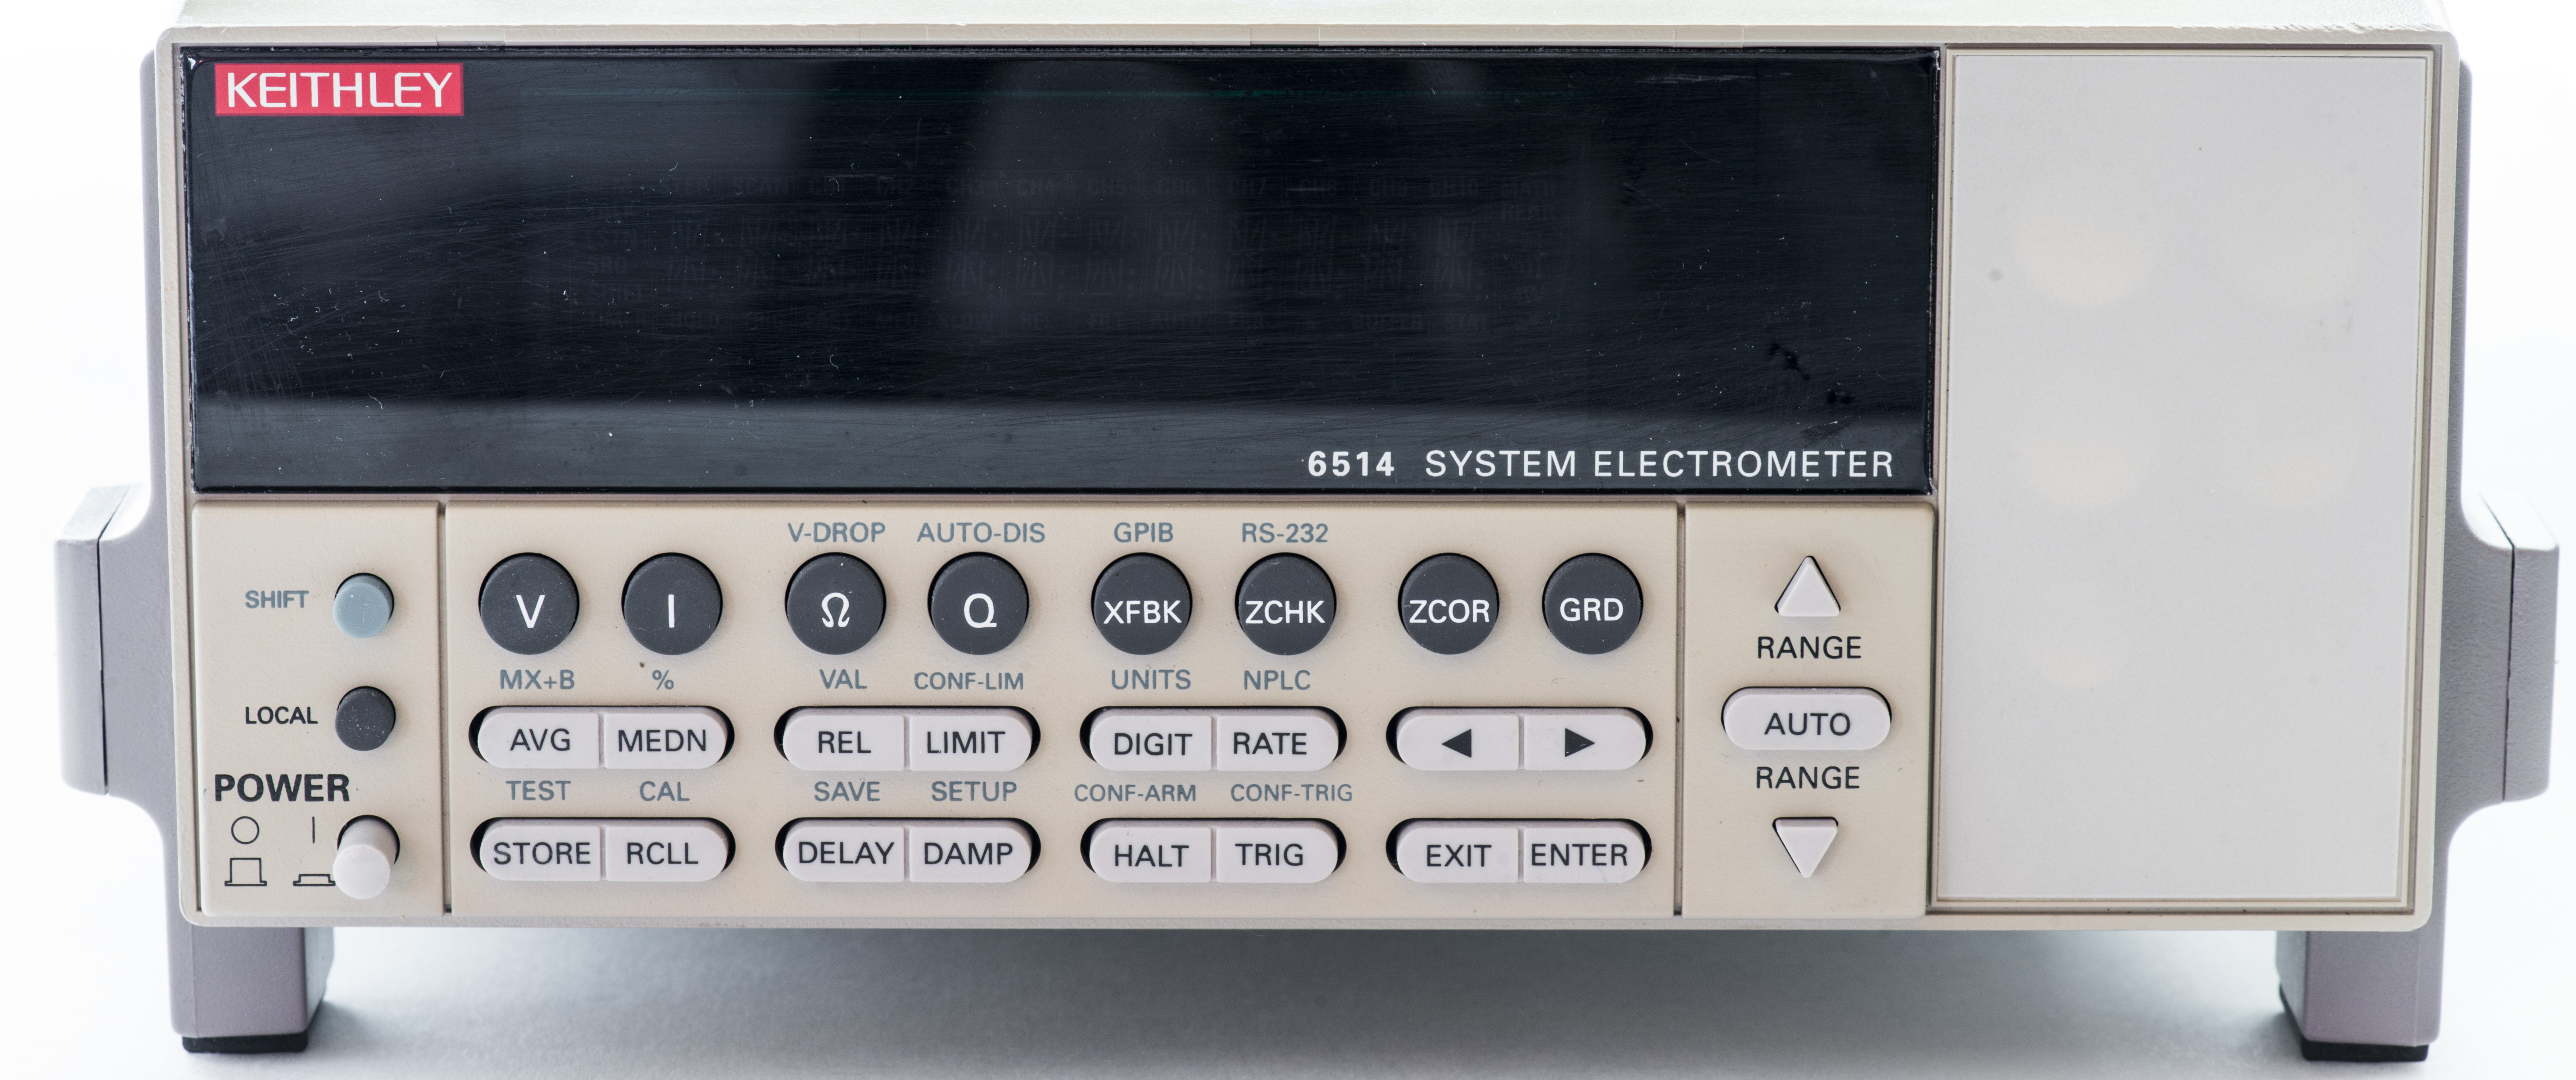 Xdevs Com Keithley 6514 Electrometer Repair